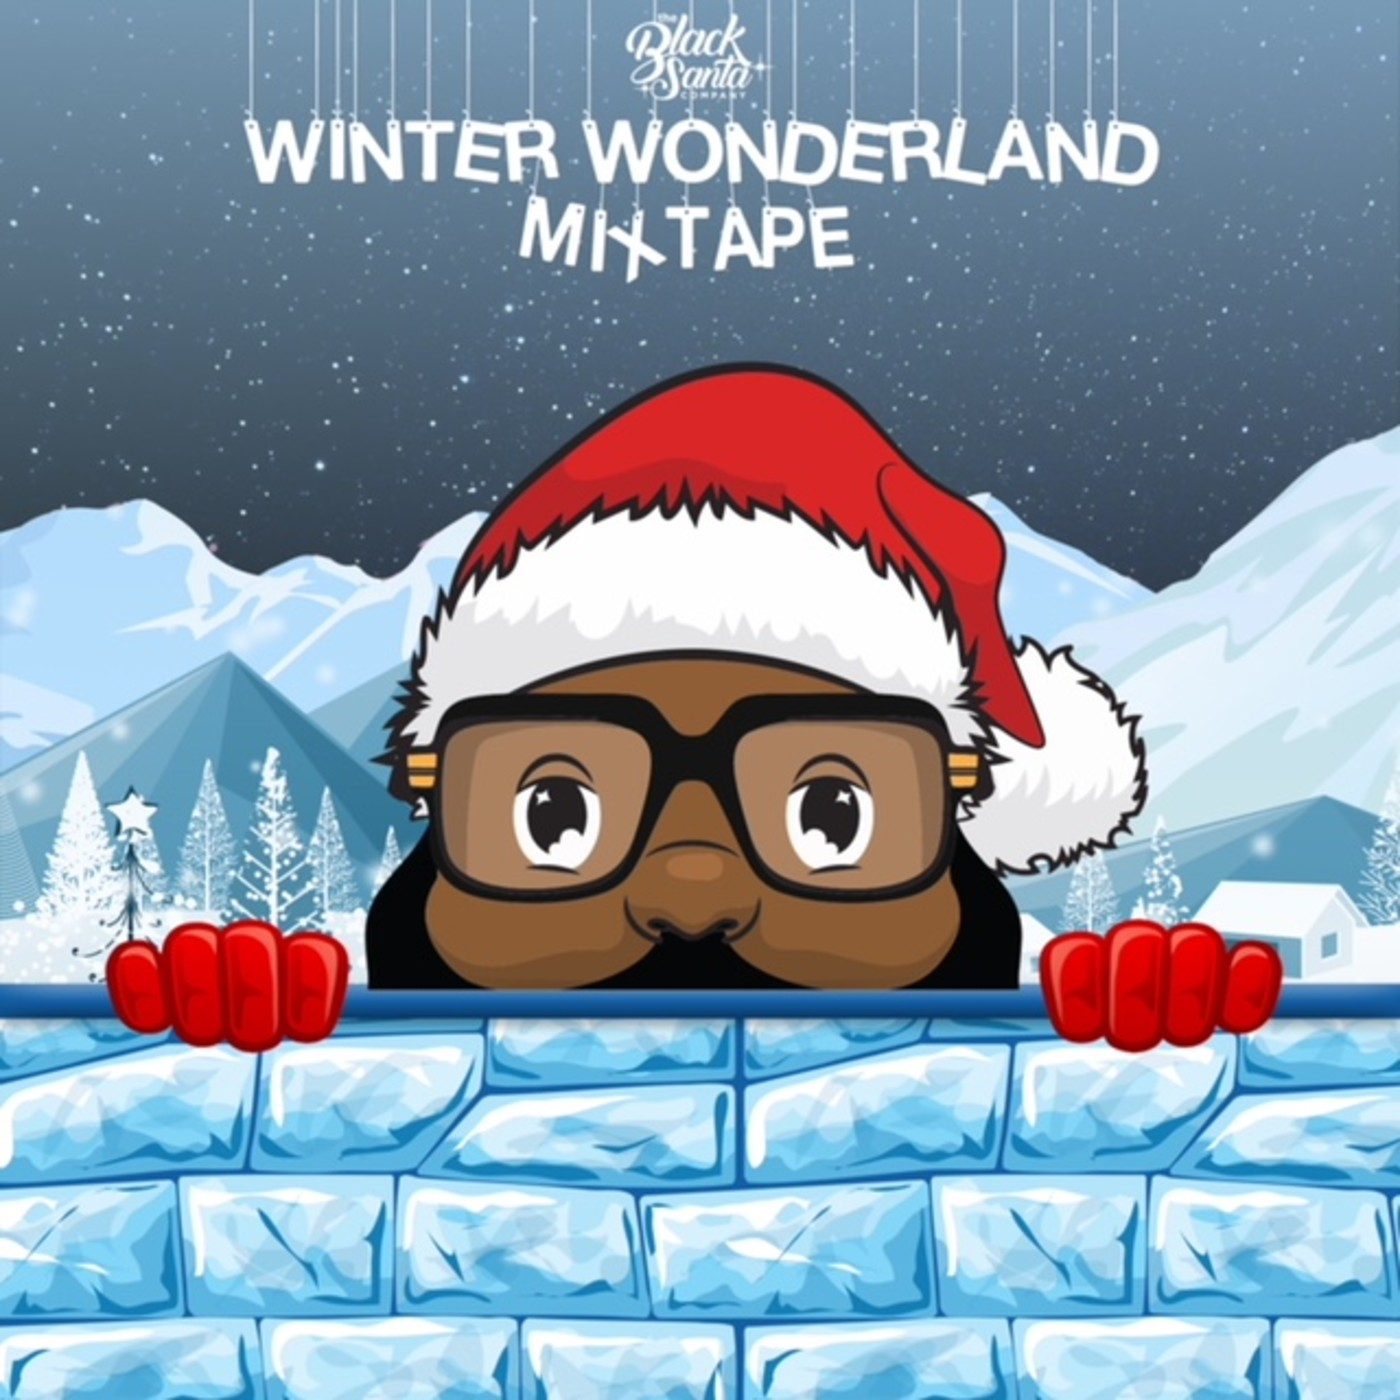 'Winter Wonderland' mixtape.